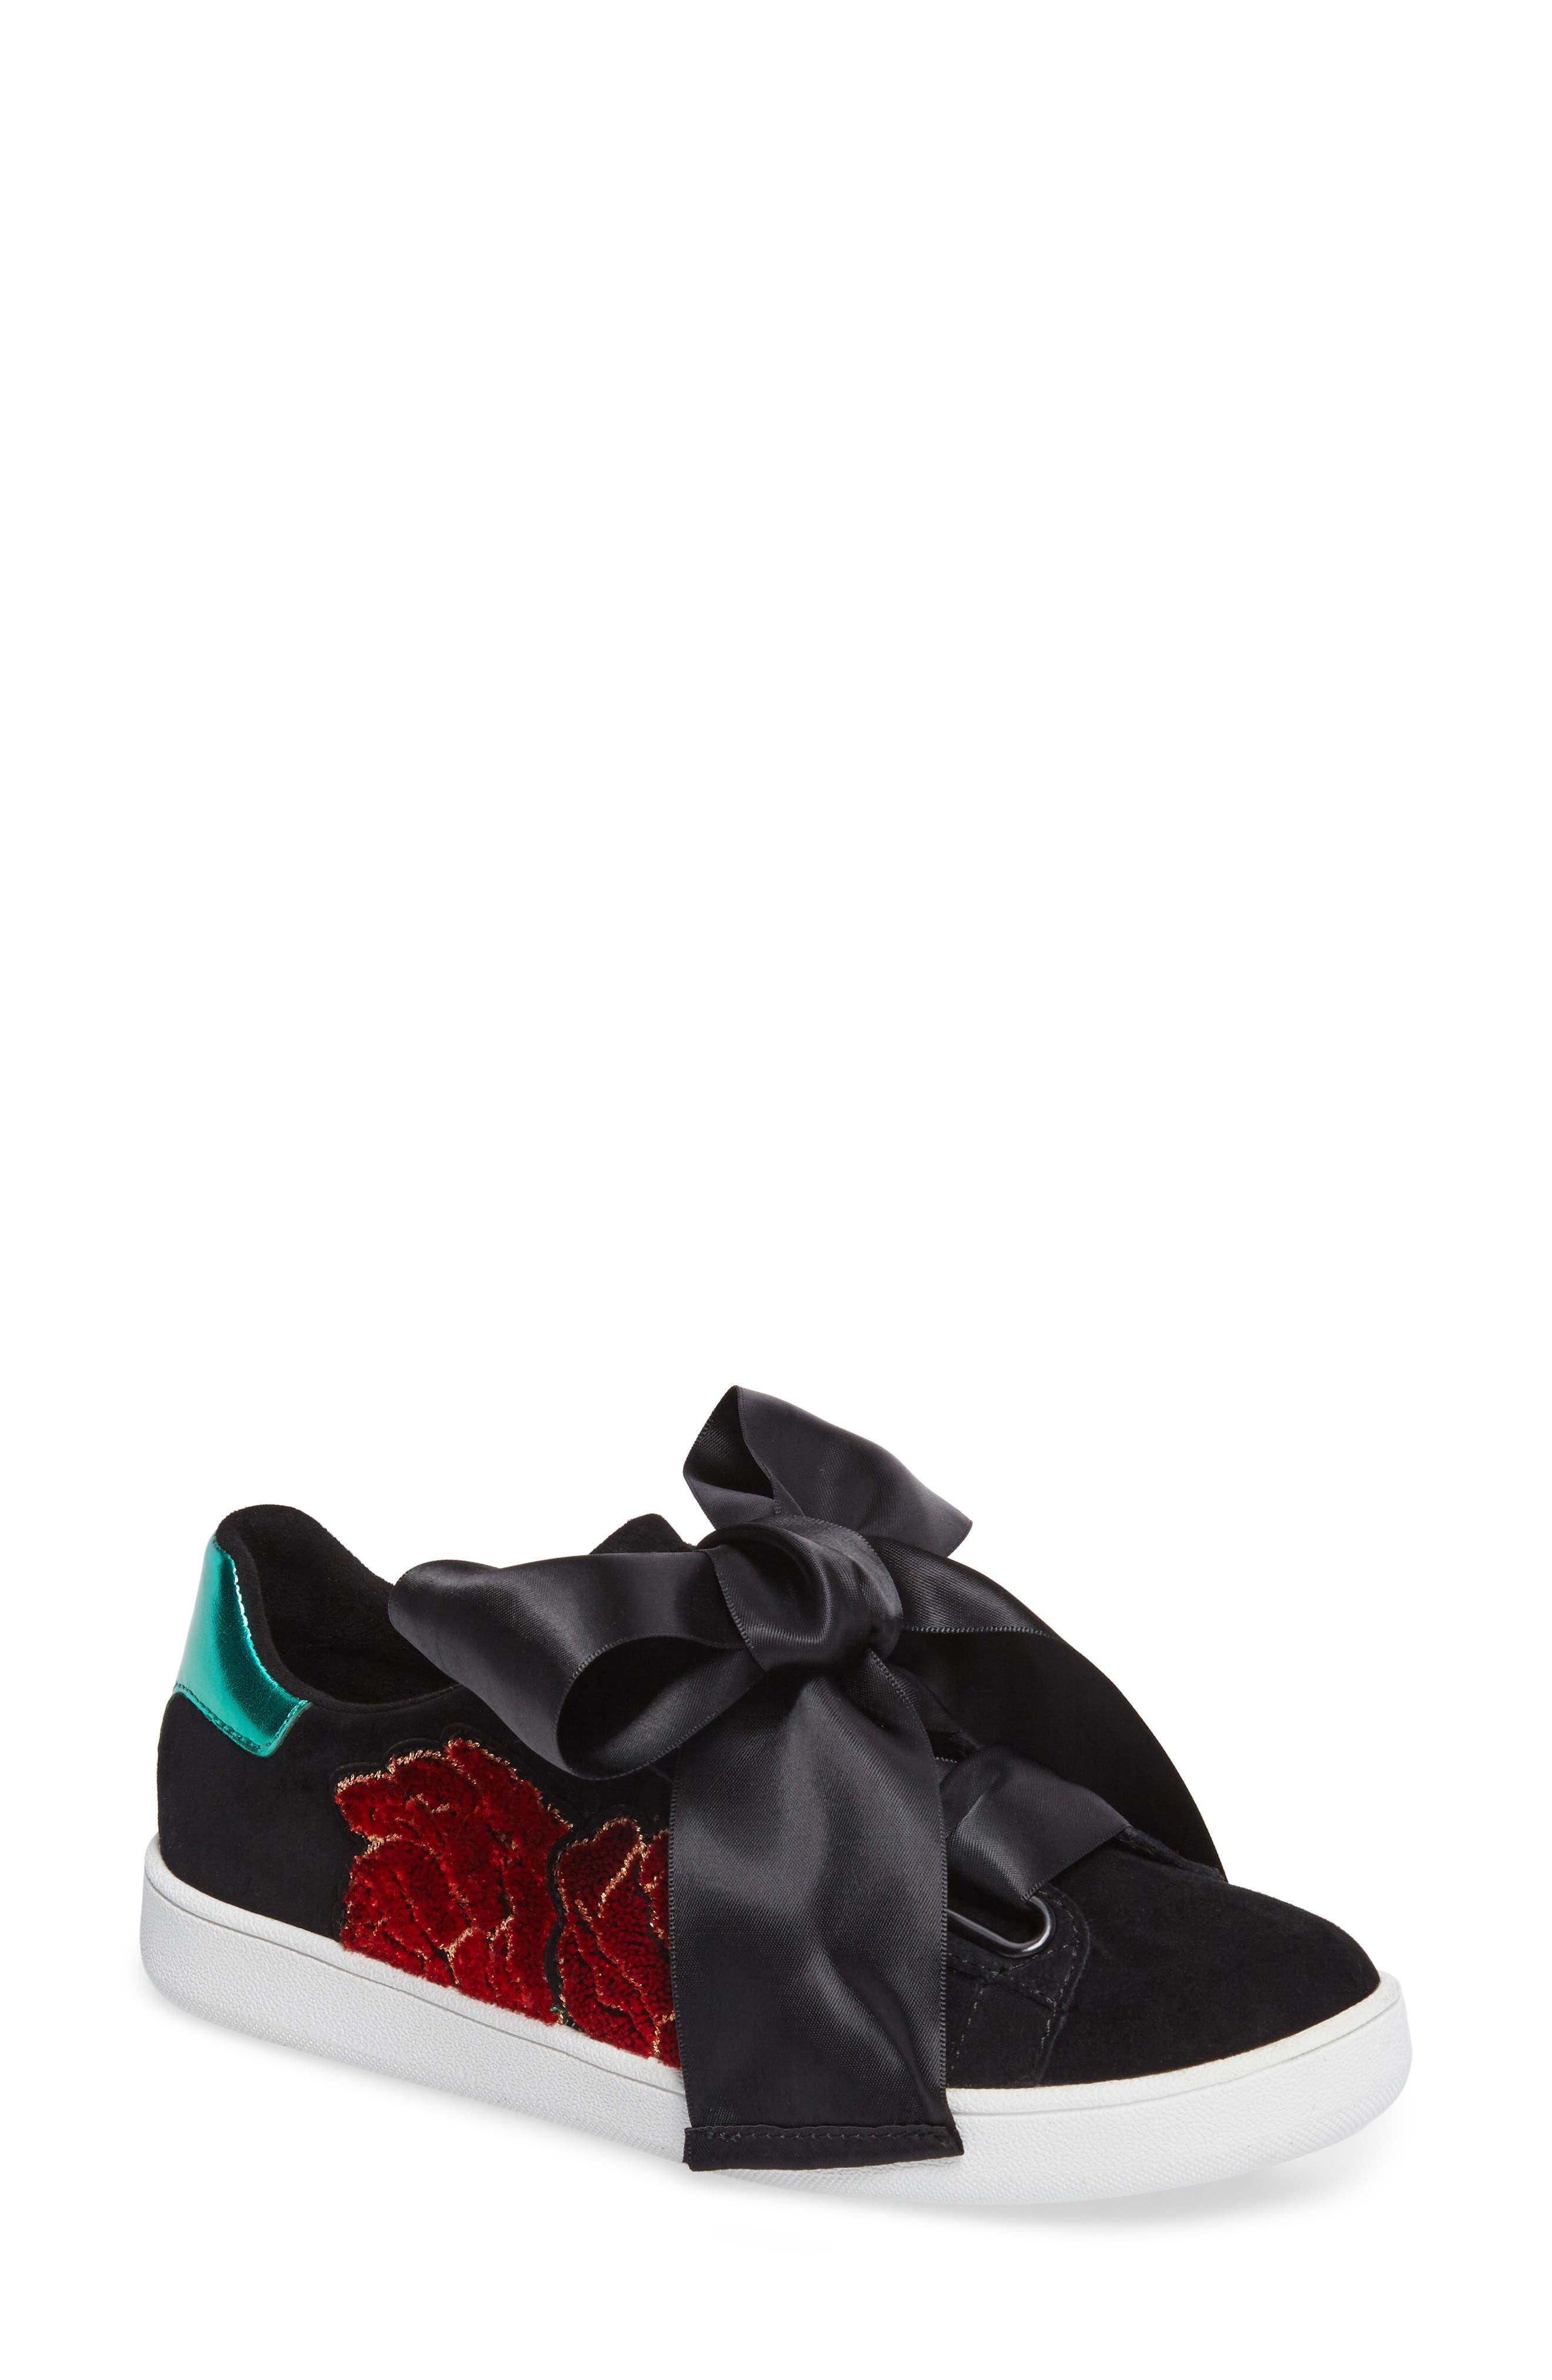 Pabst Low-Top Sneaker,                             Main thumbnail 1, color,                             001